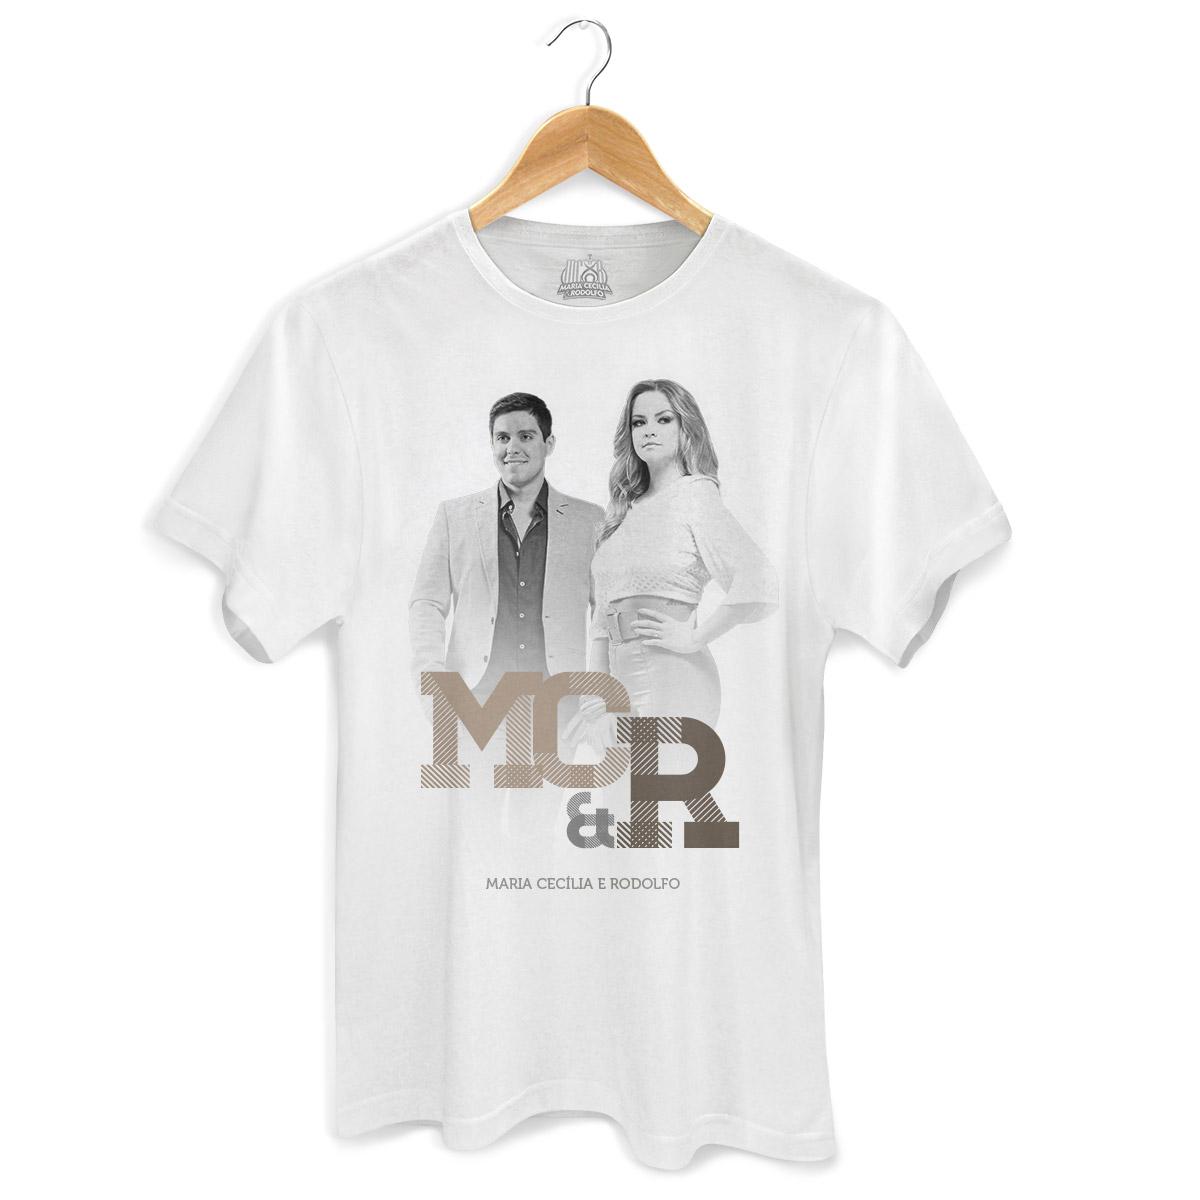 Camiseta Masculina Maria Cecília & Rodolfo Foto PB